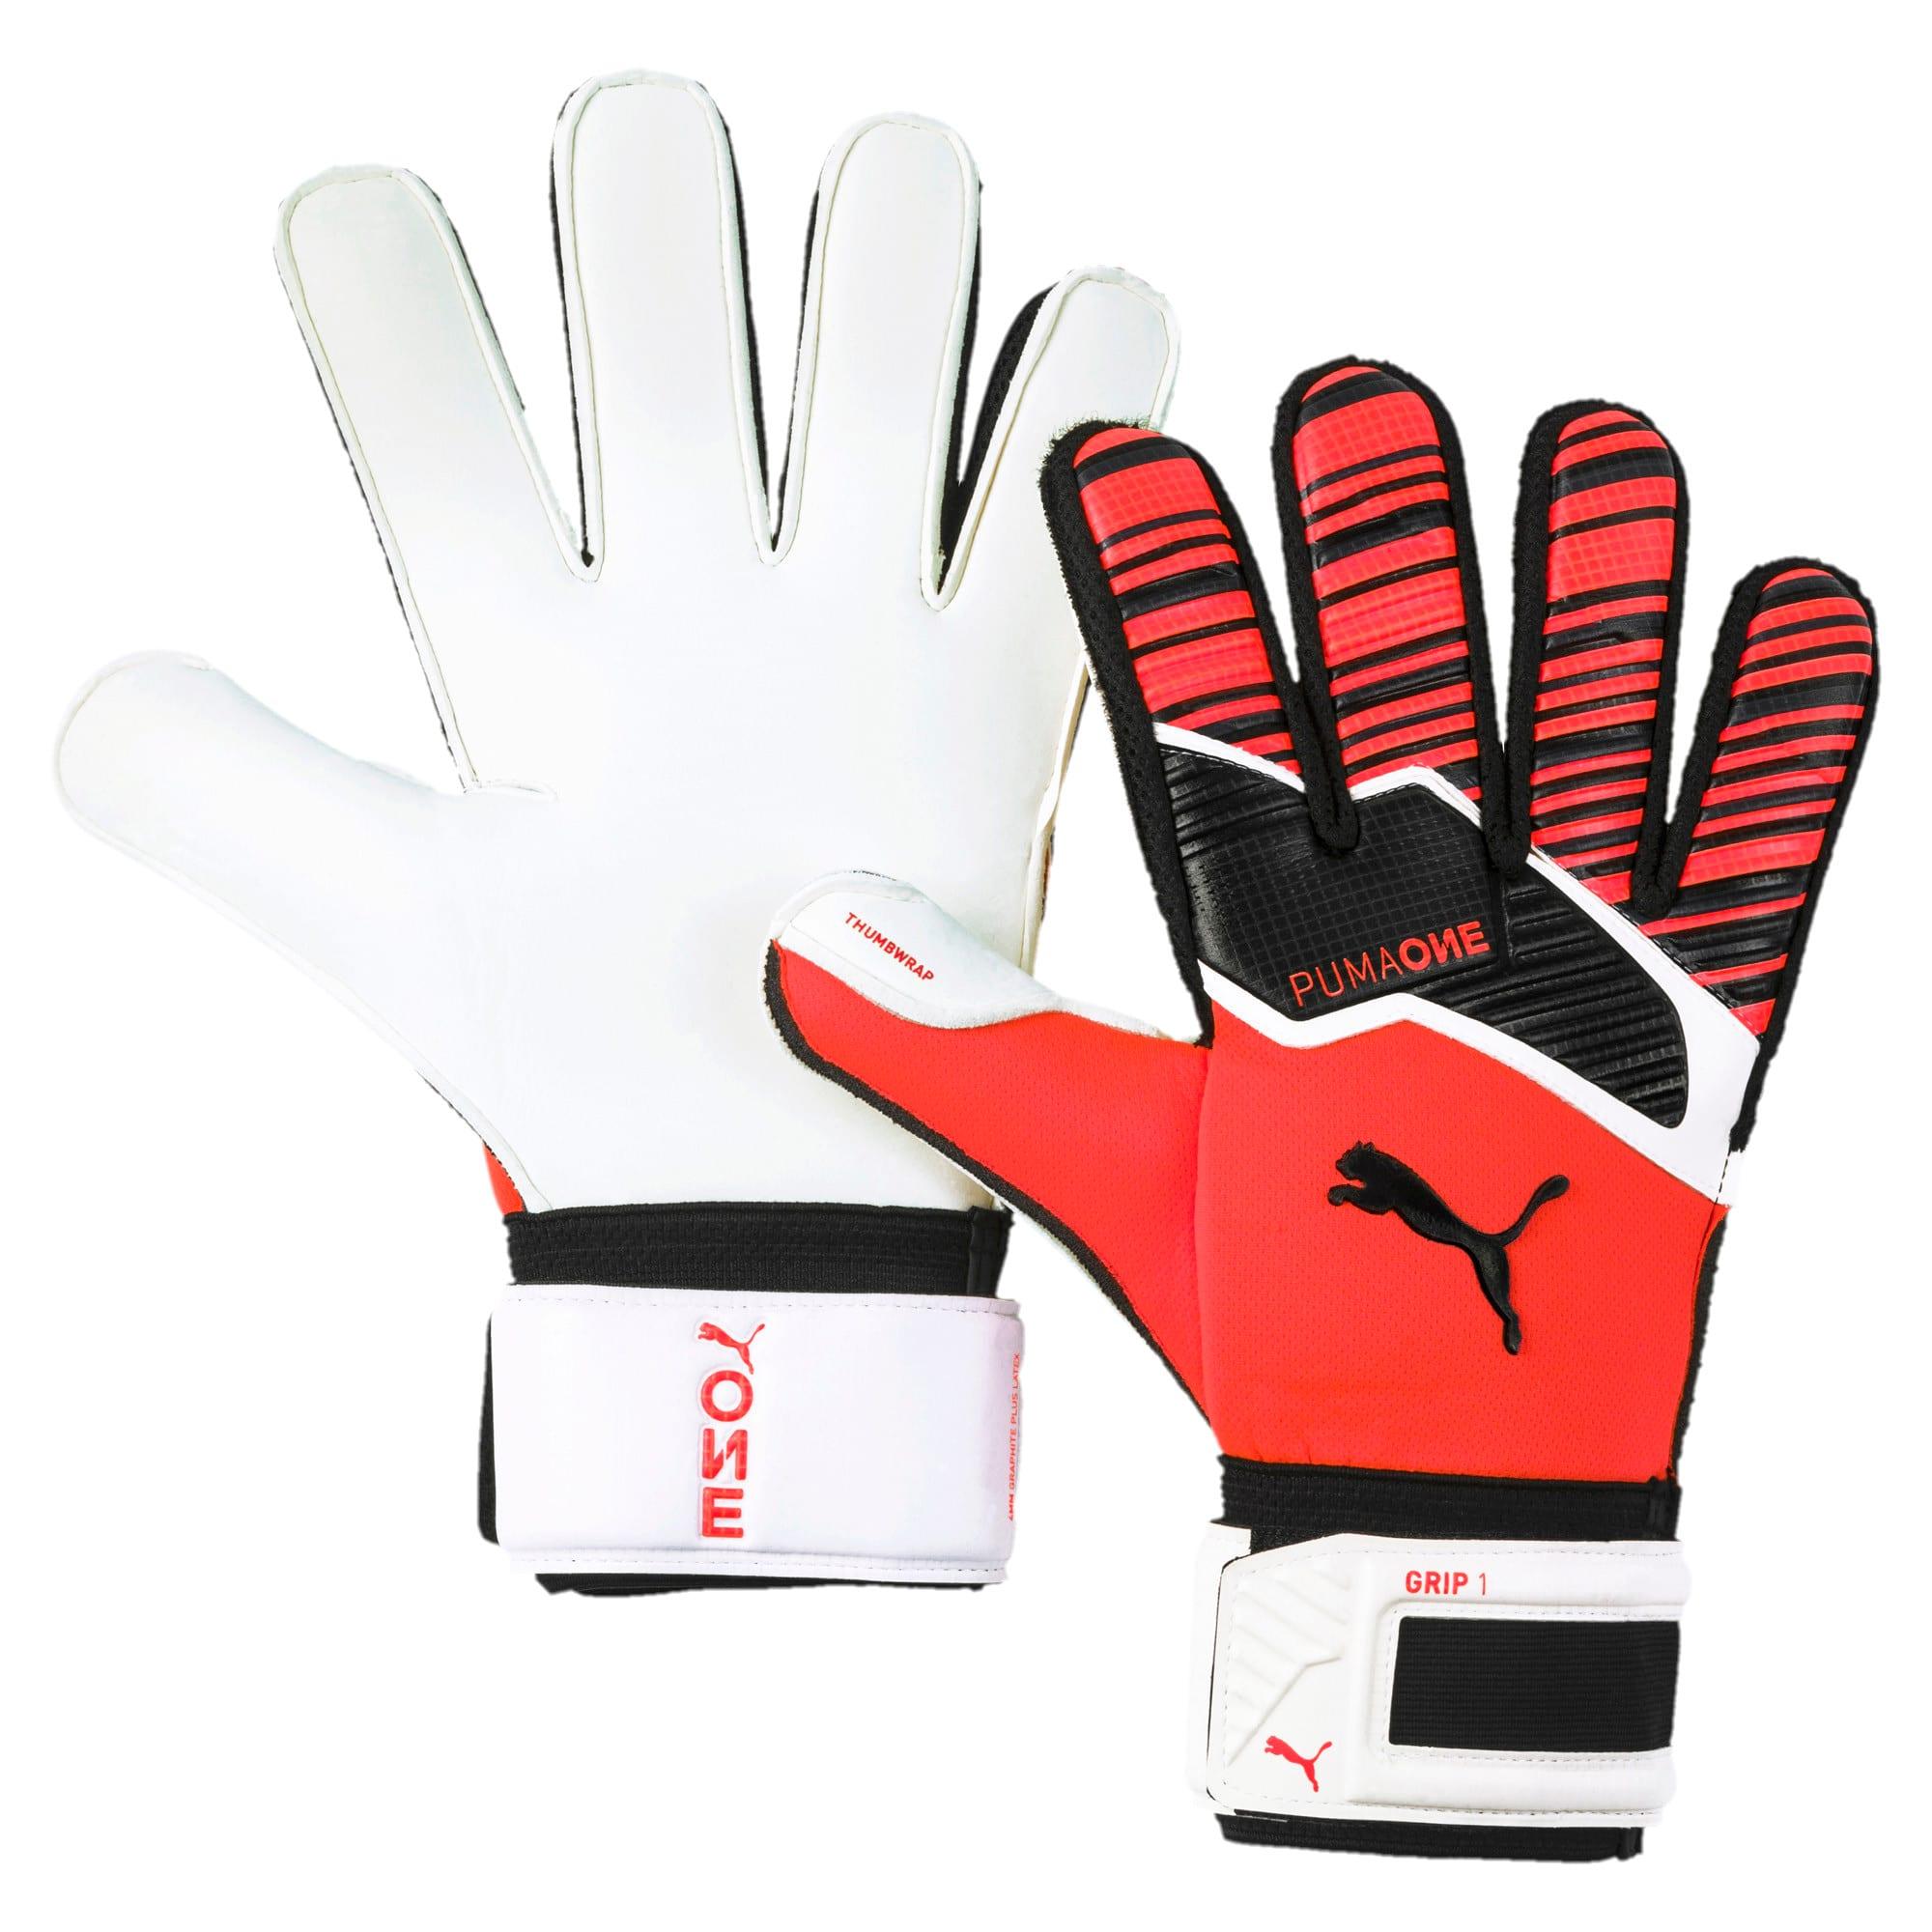 Thumbnail 1 of プーマ ワン グリップ 1 RC サッカー ゴールキーパーグローブ, Nrgy Red-Black-Puma White, medium-JPN